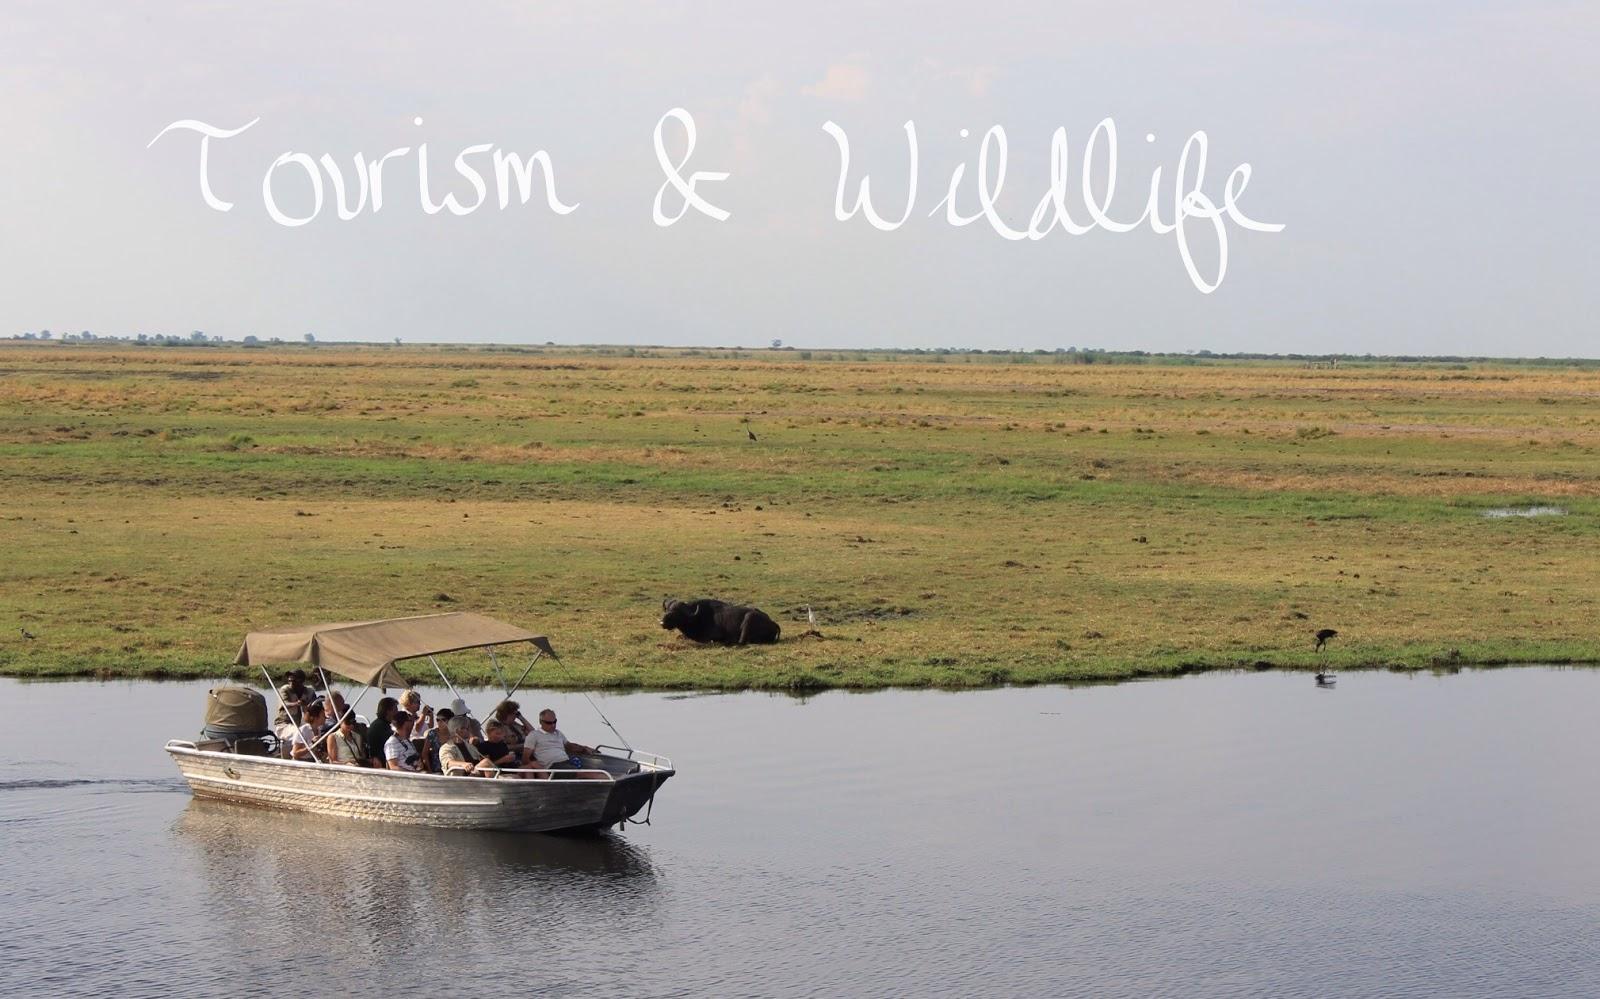 tourists cruise along the Chobe River